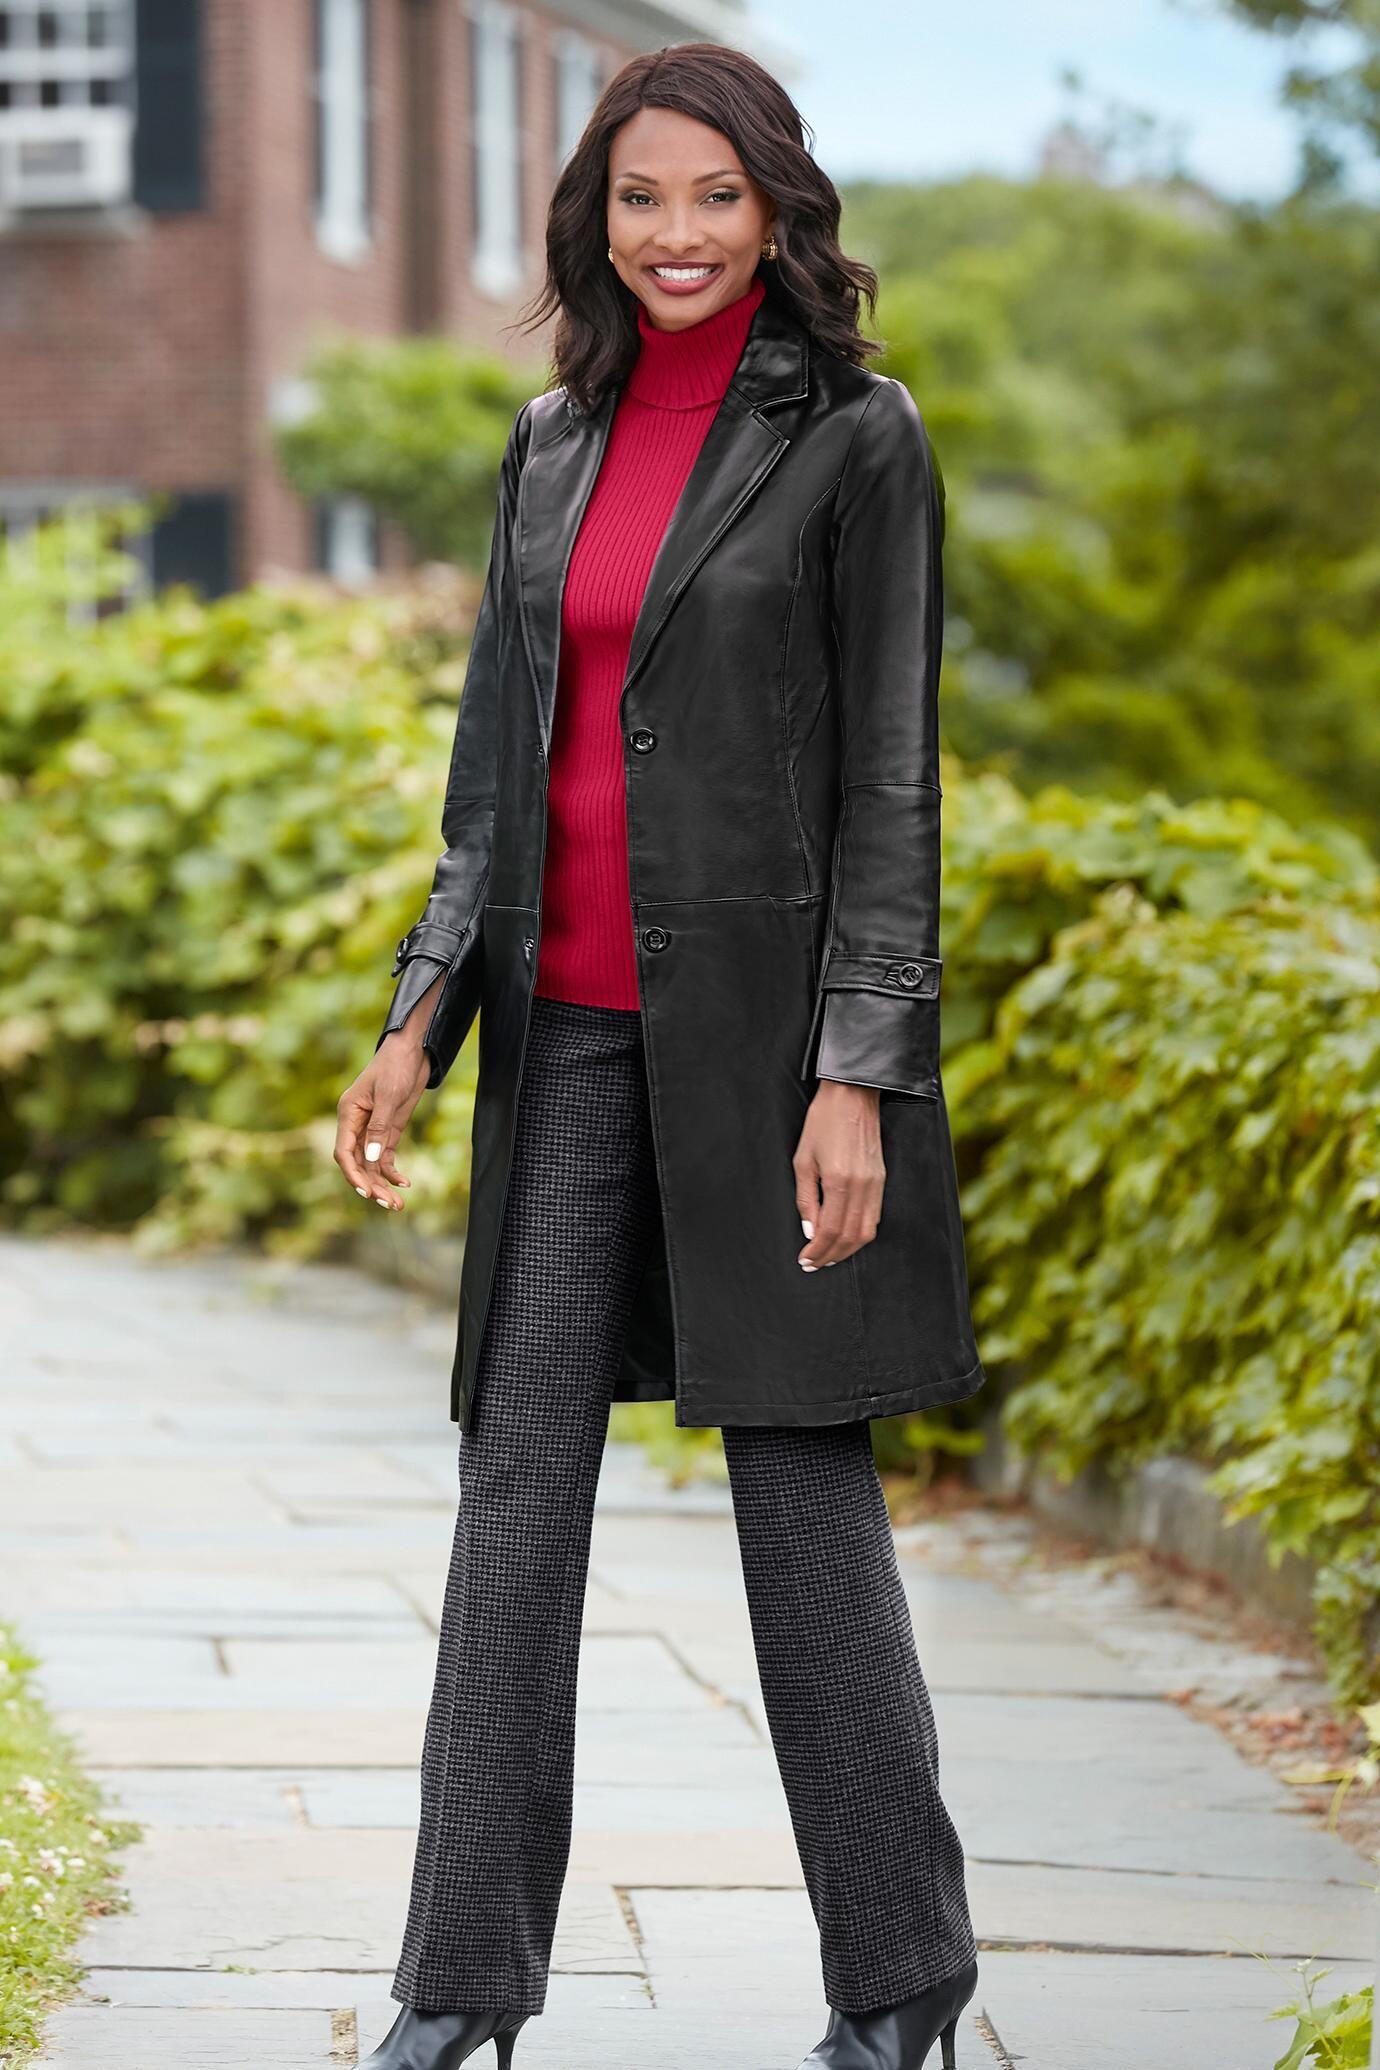 The Newbury 3/4Length Genuine Leather Coat Classic Women